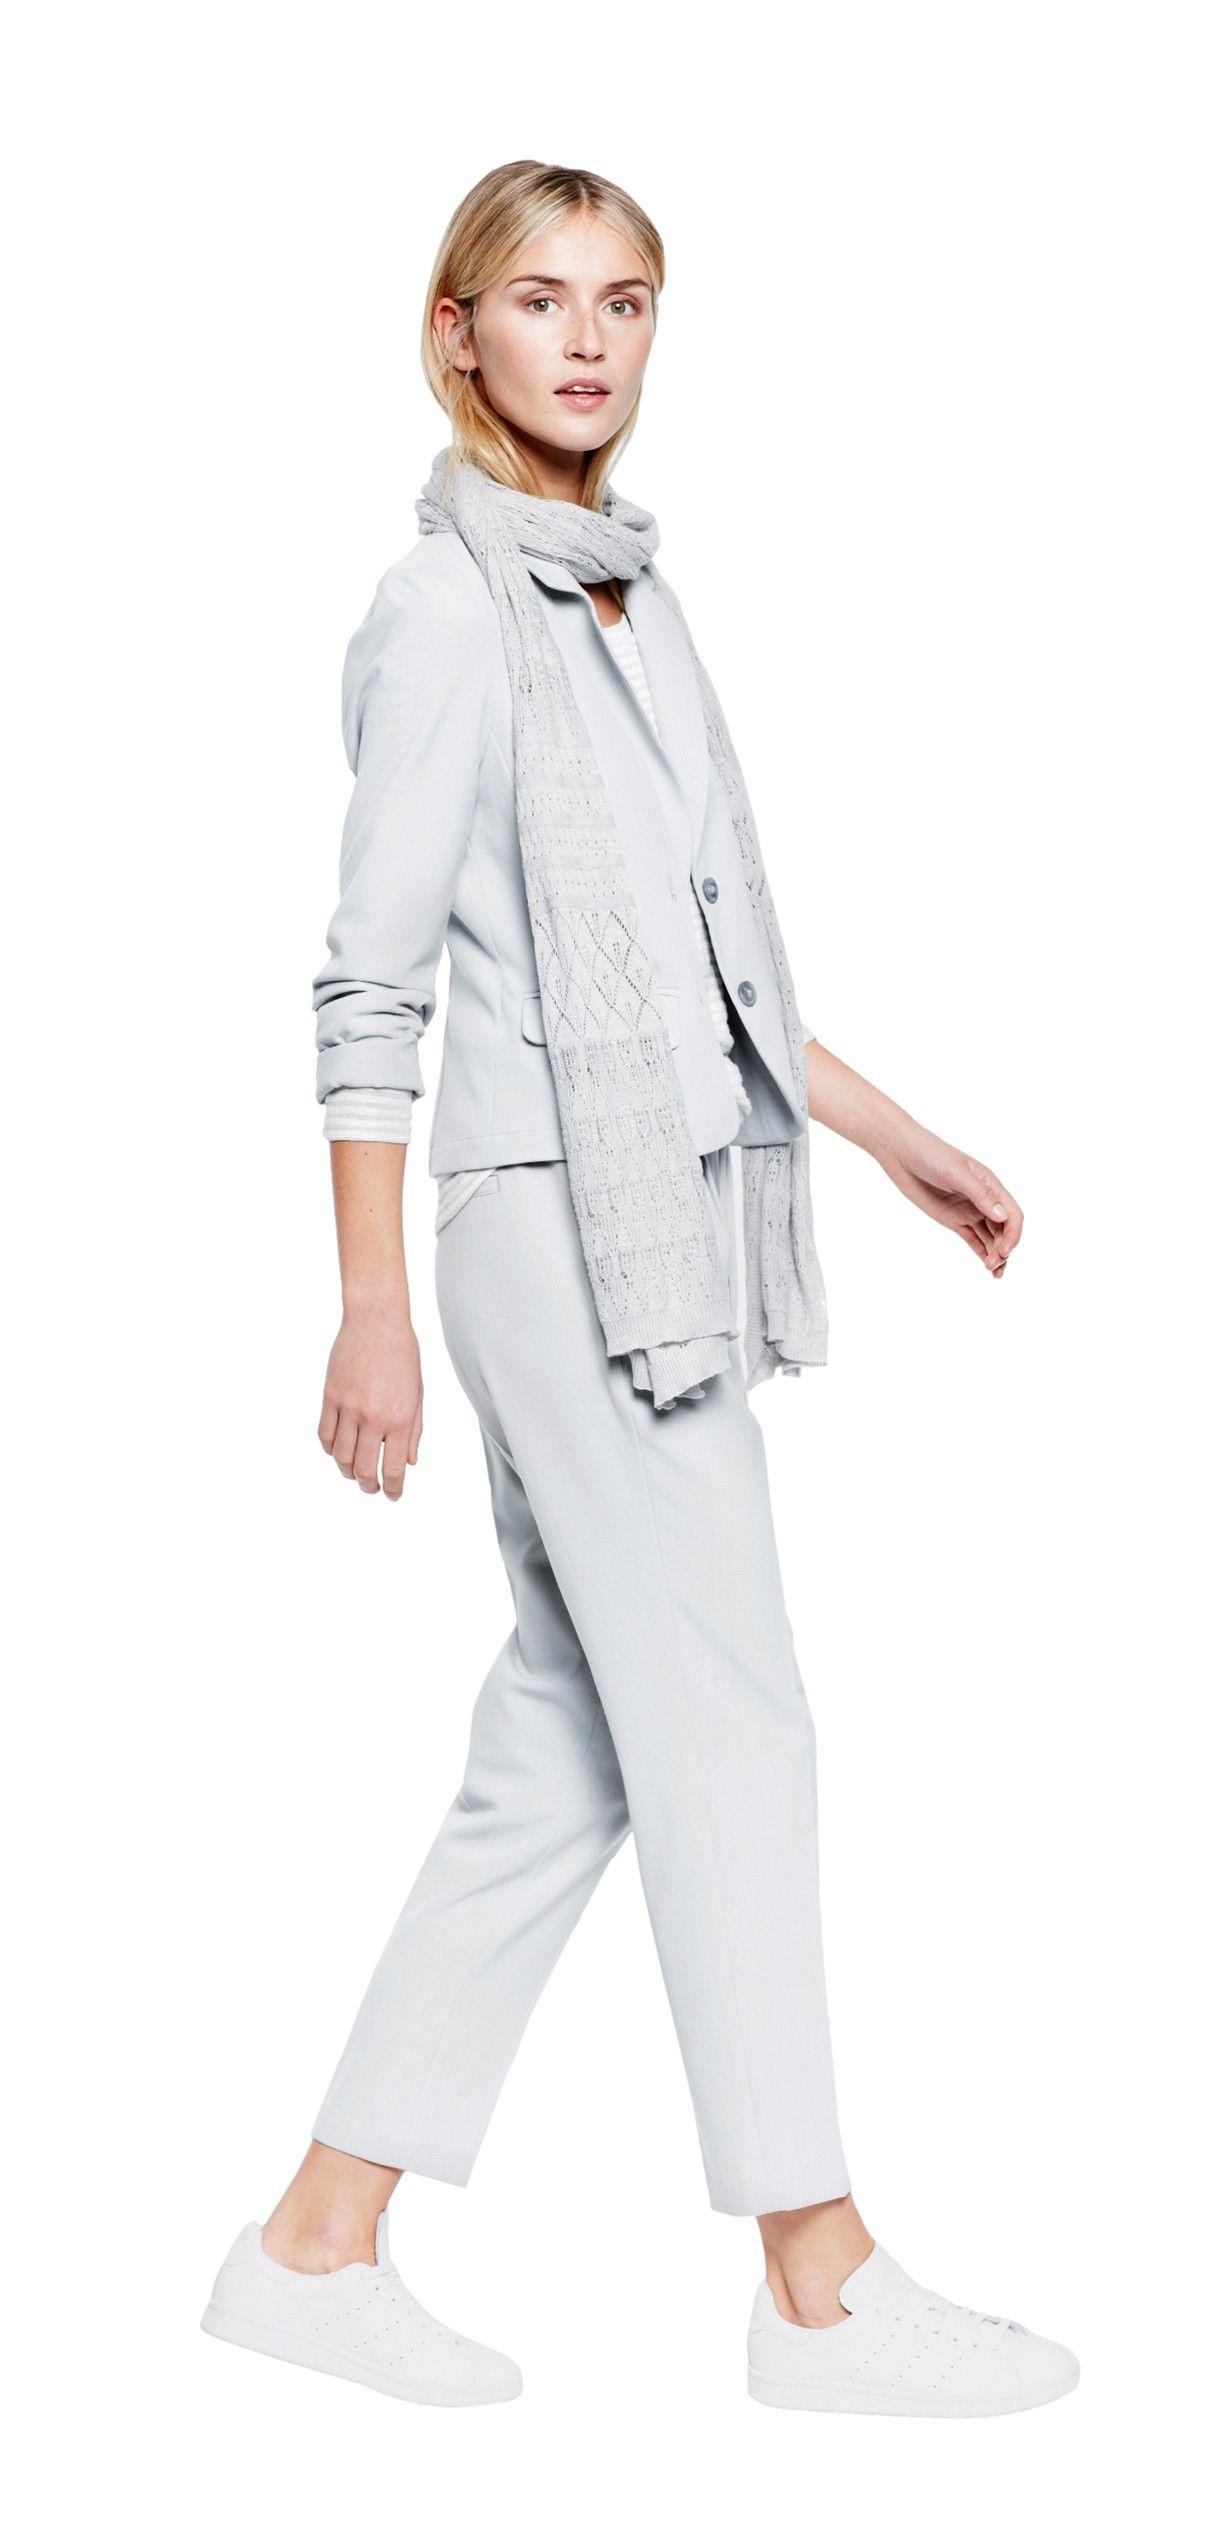 opus mode kaufen